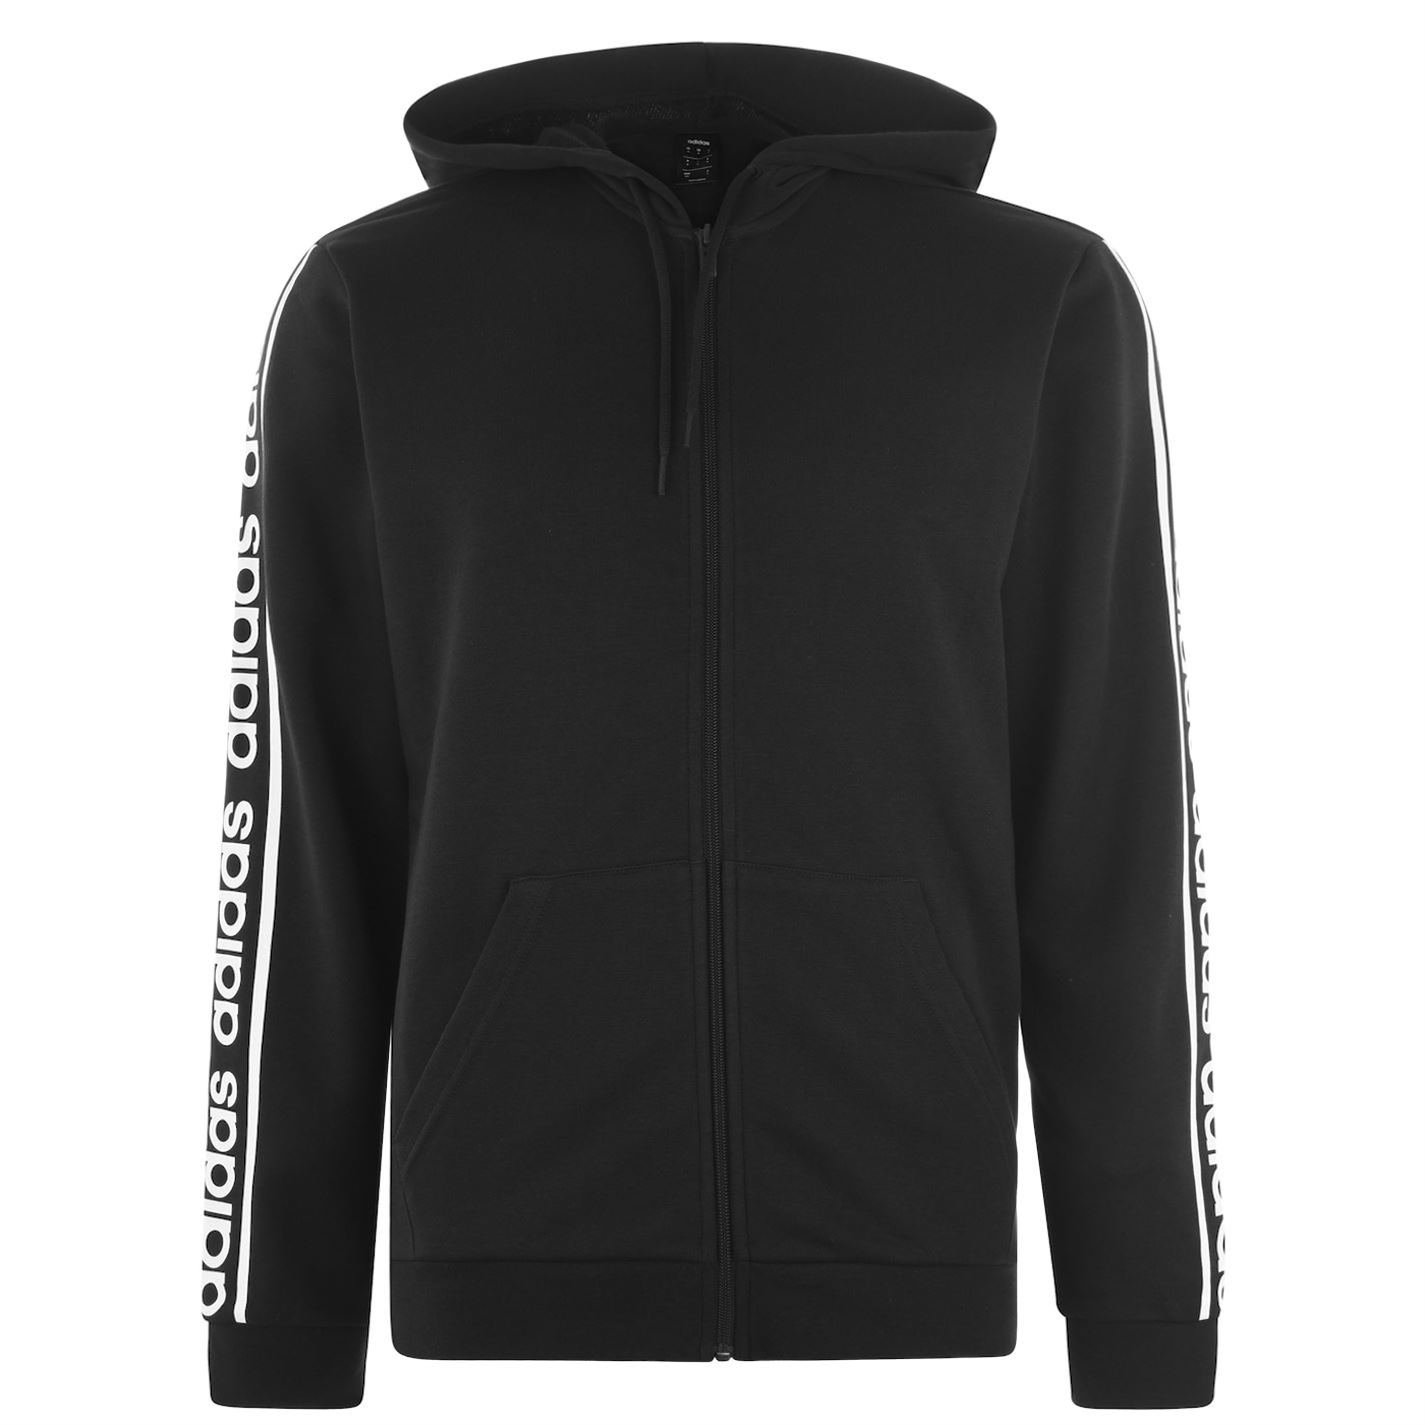 Adidas C90 Zip Hoody Mens